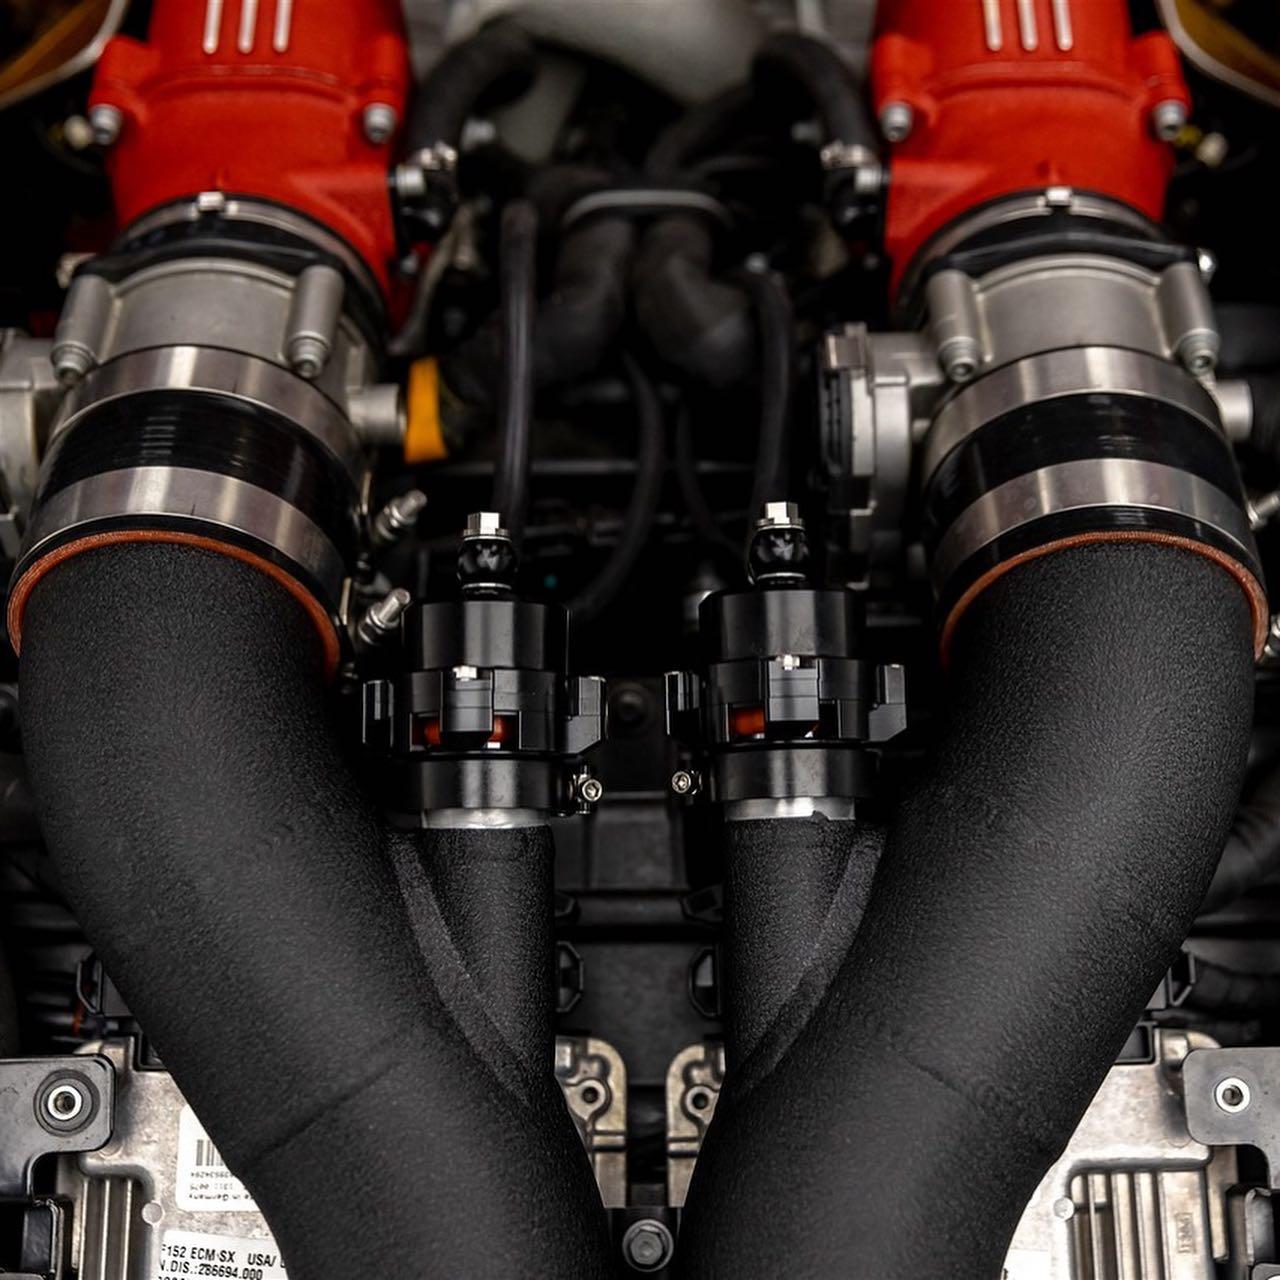 Twin-Turbo-Ferrari-F12-Berlinetta-by-Daily-Driven-Exotics-17